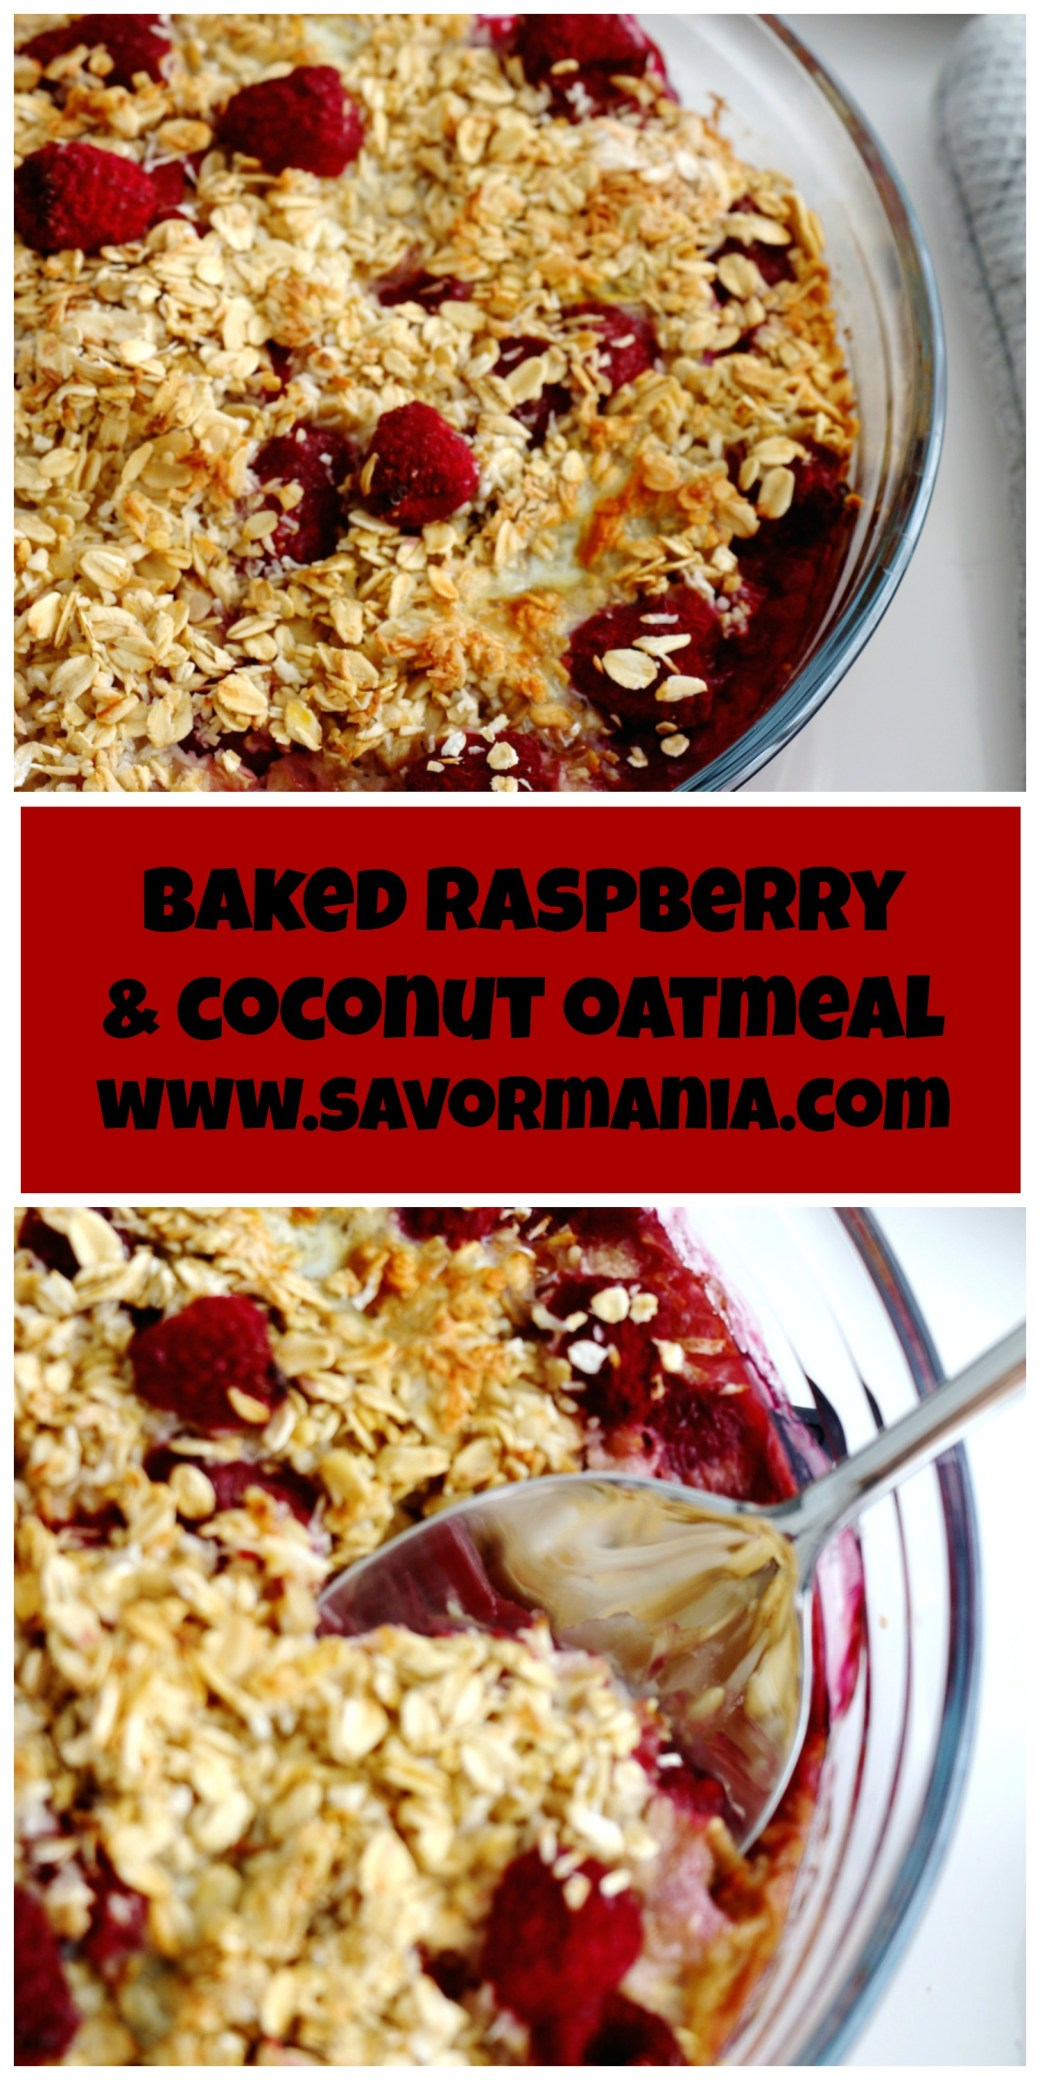 baked raspberry and coconut oatmeal | www.savormania.com